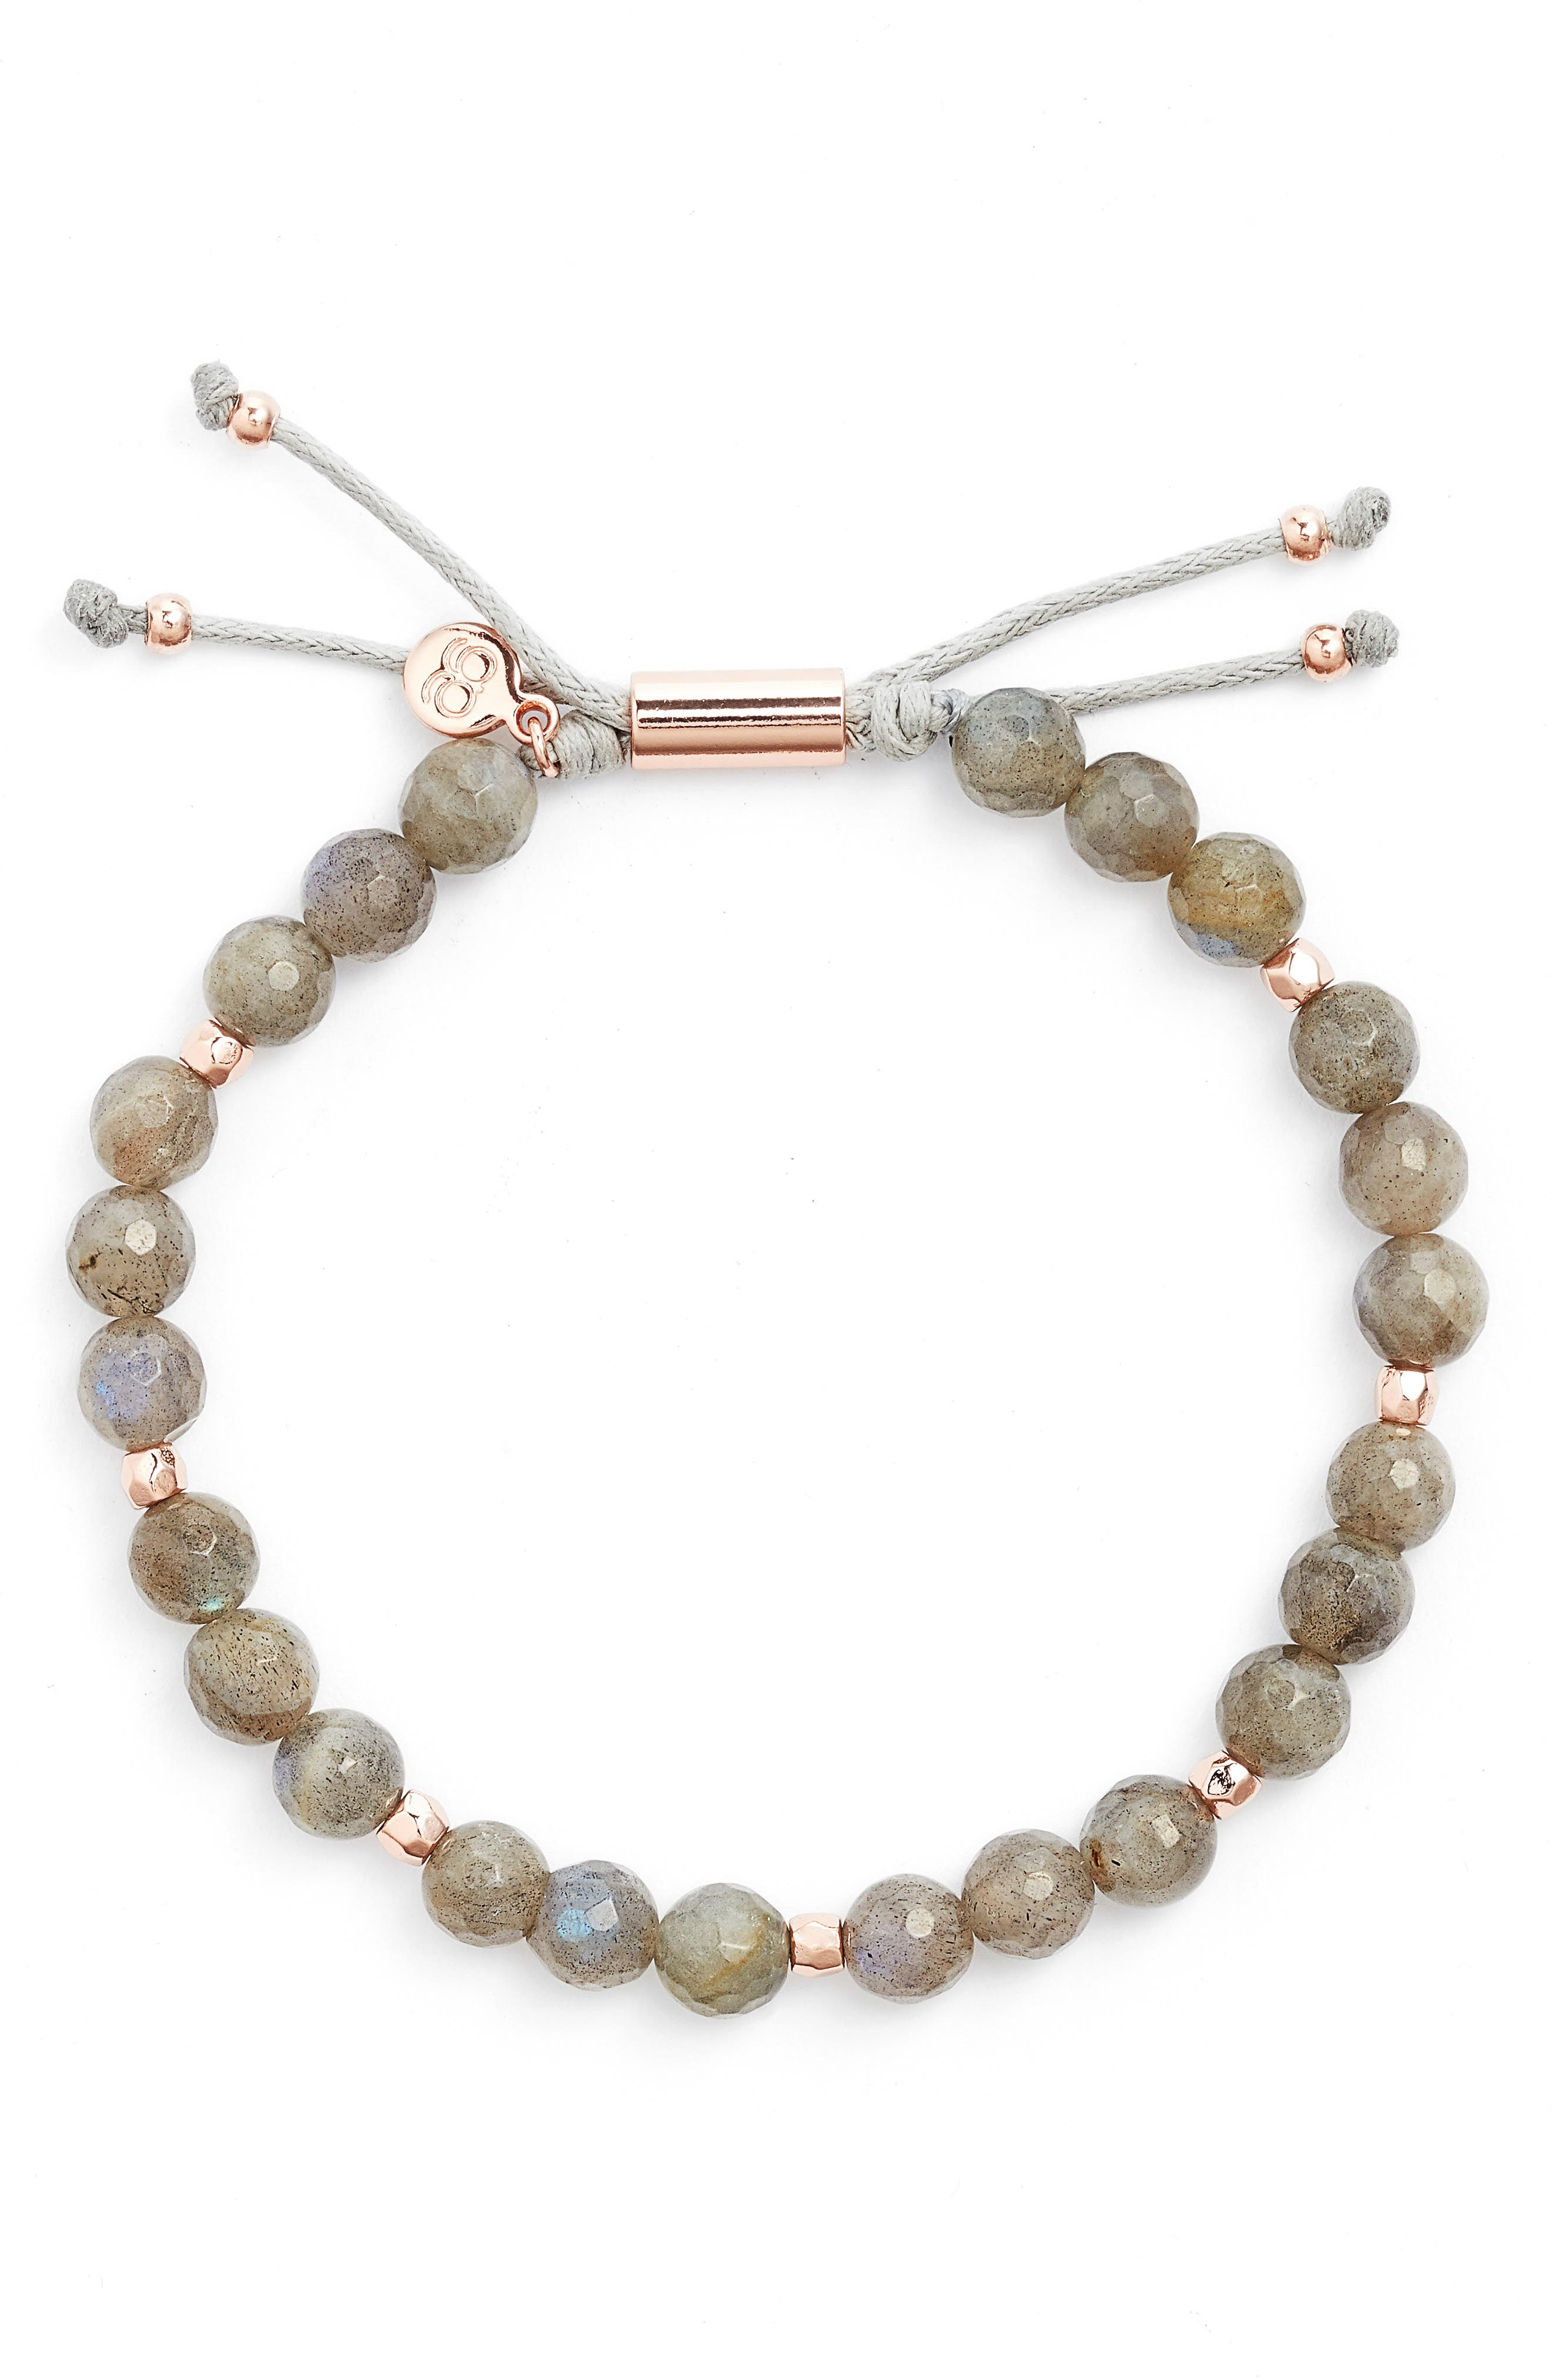 Power Bead Adjustable Bracelet,                             Main thumbnail 1, color,                             Labradorite/ Rose Gold